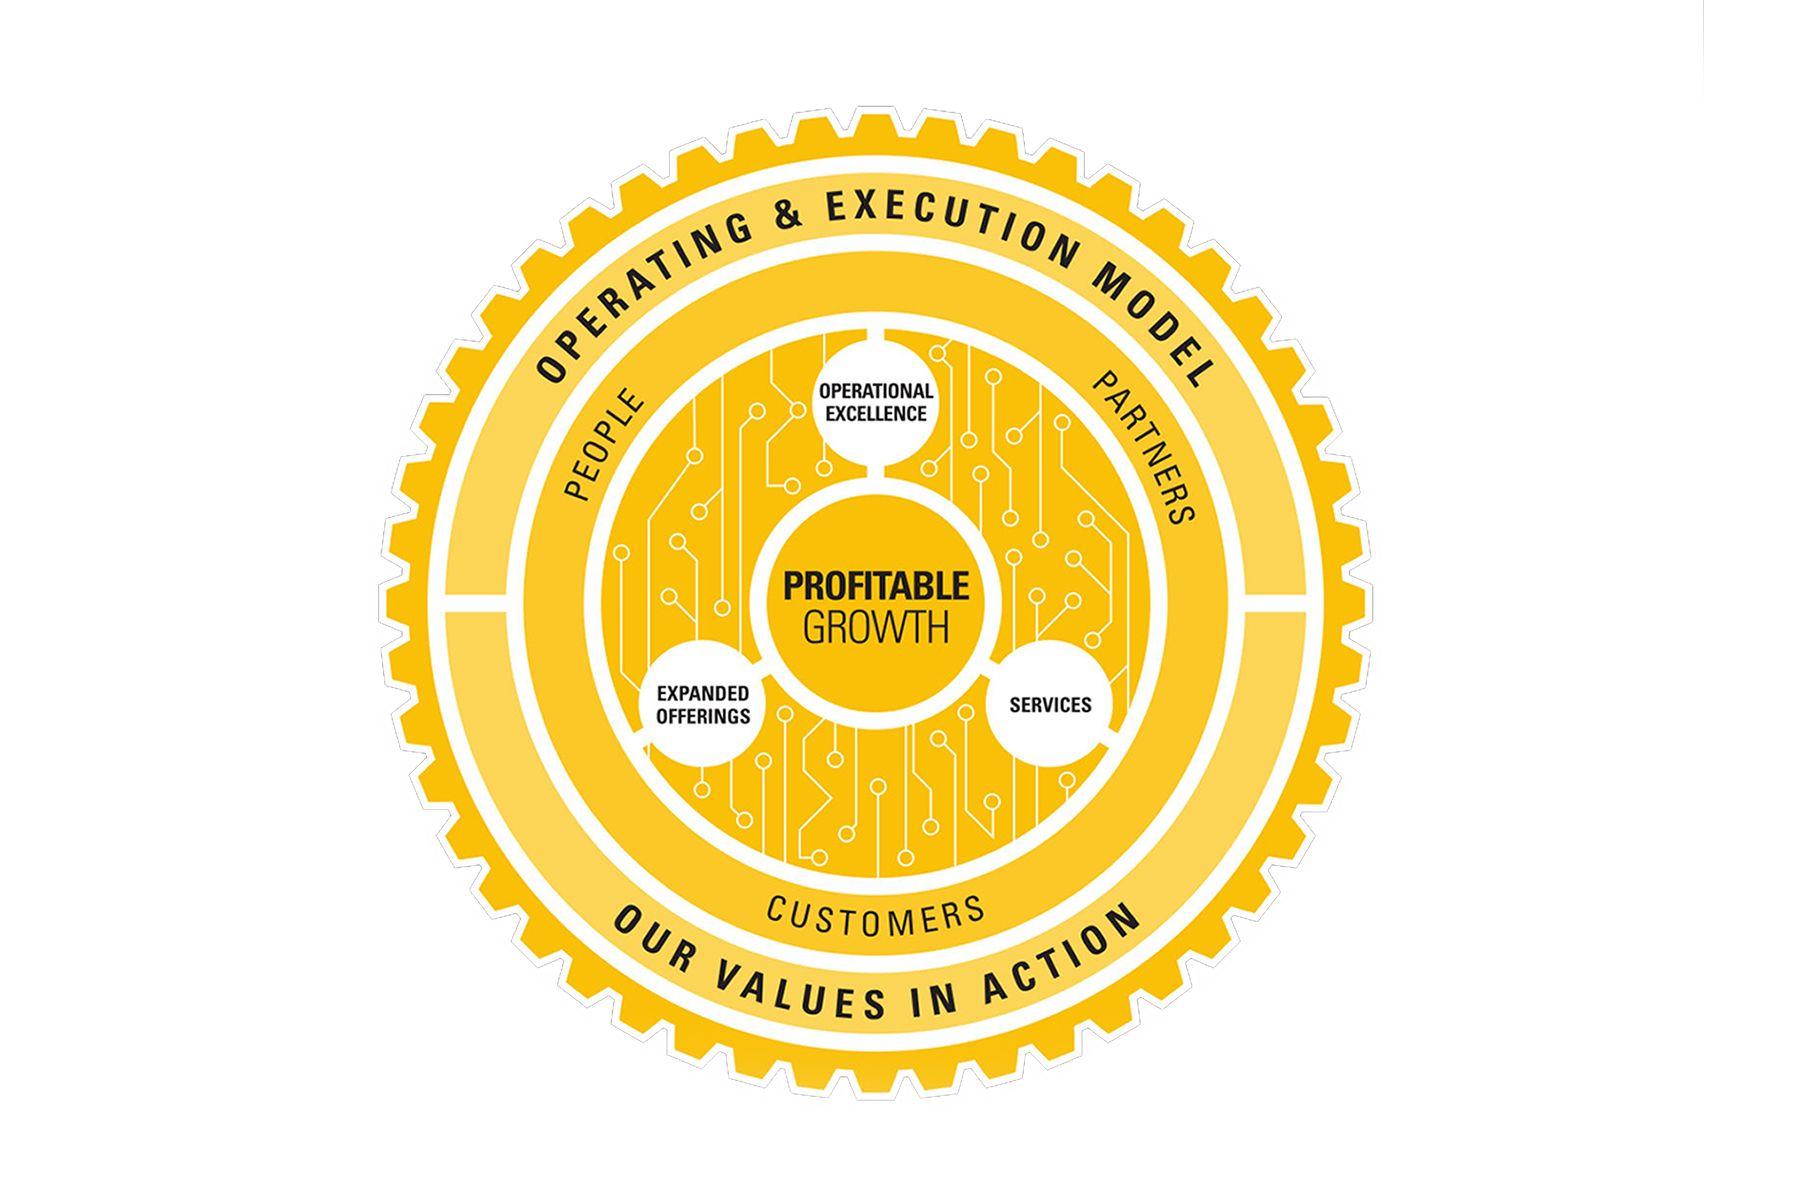 Operating & Execution Model